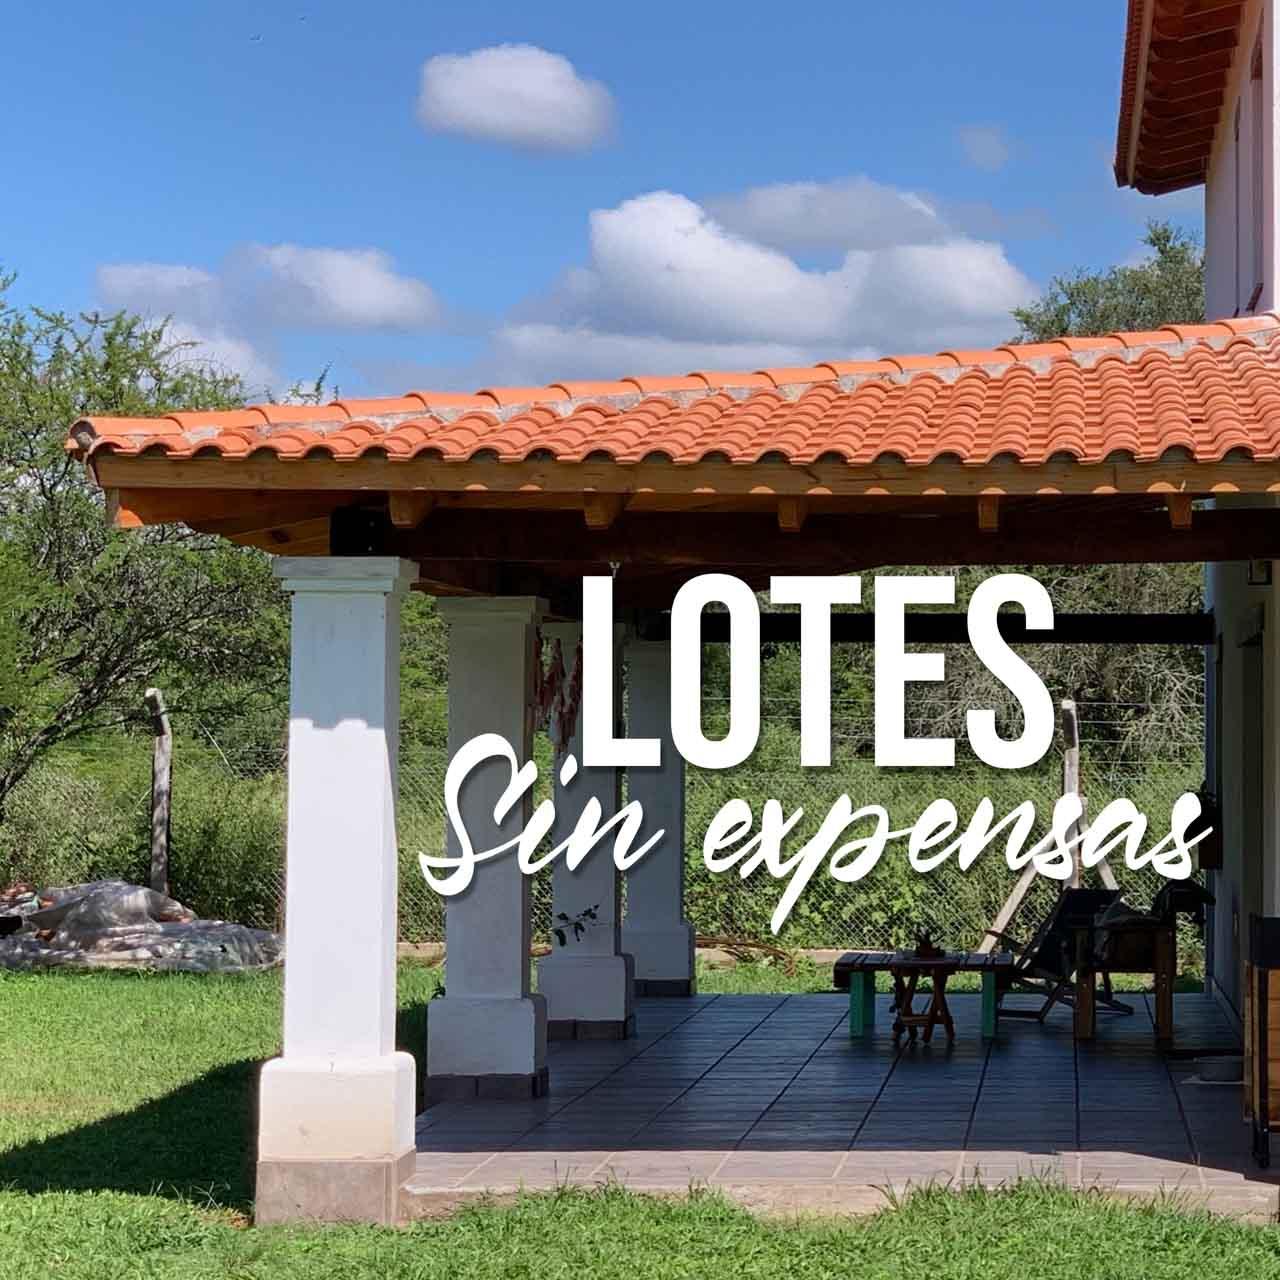 LOTES-Sin-expensas-web-modificado-bis